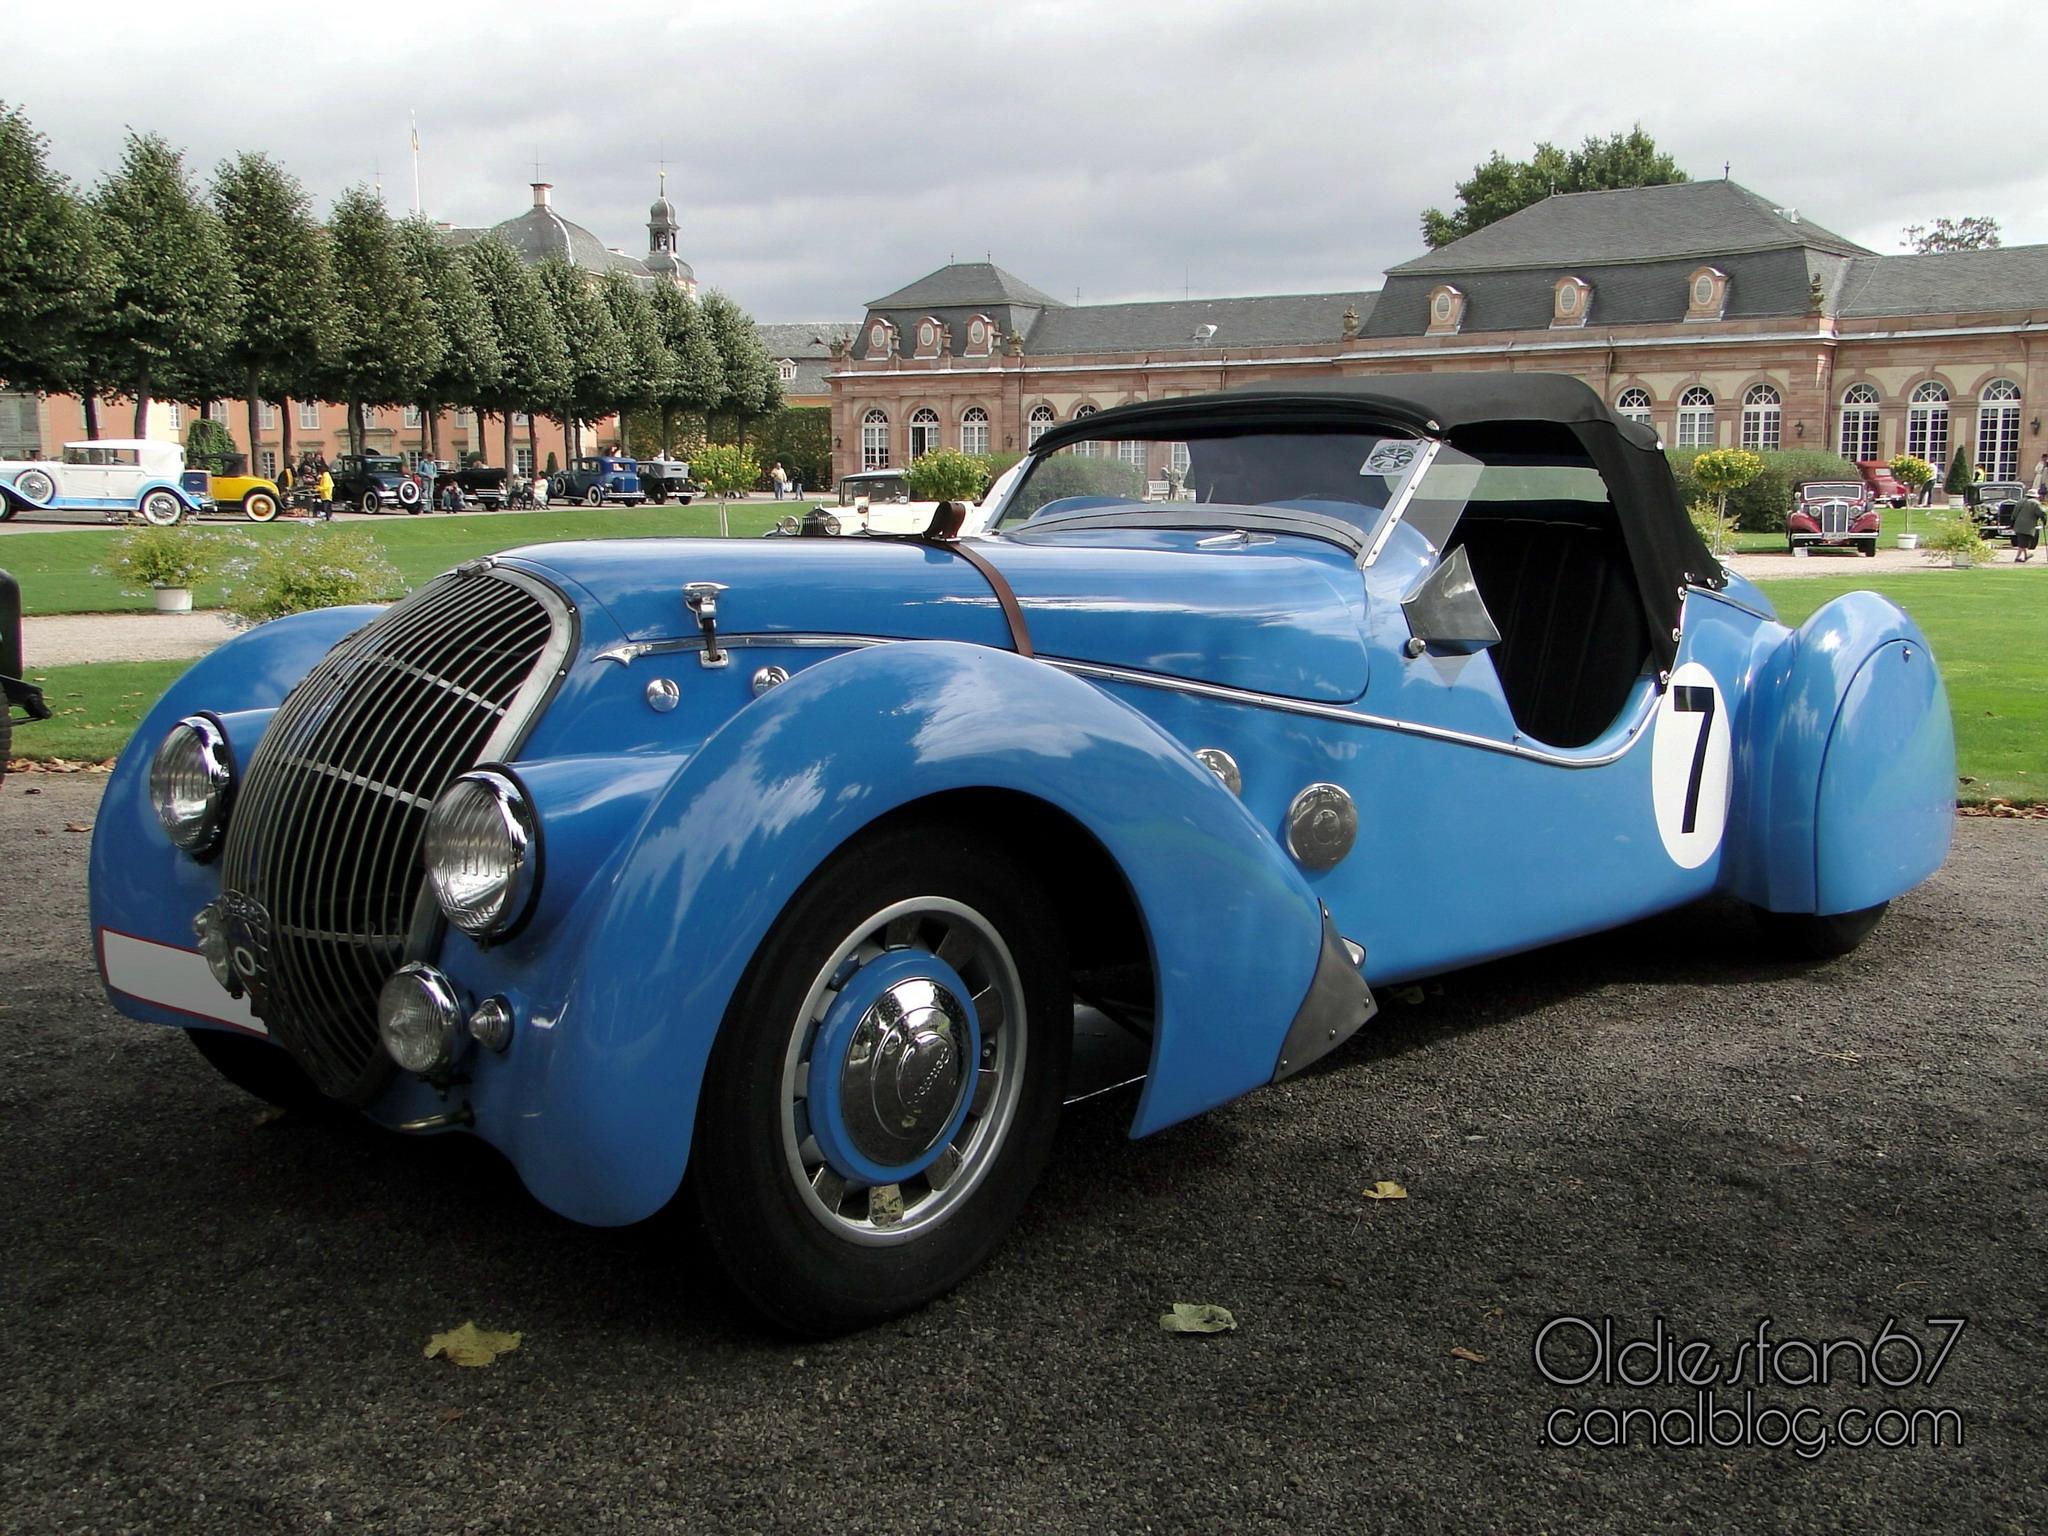 peugeot 402 darl 39 mat special sport roadster 1938 oldiesfan67 mon blog auto. Black Bedroom Furniture Sets. Home Design Ideas